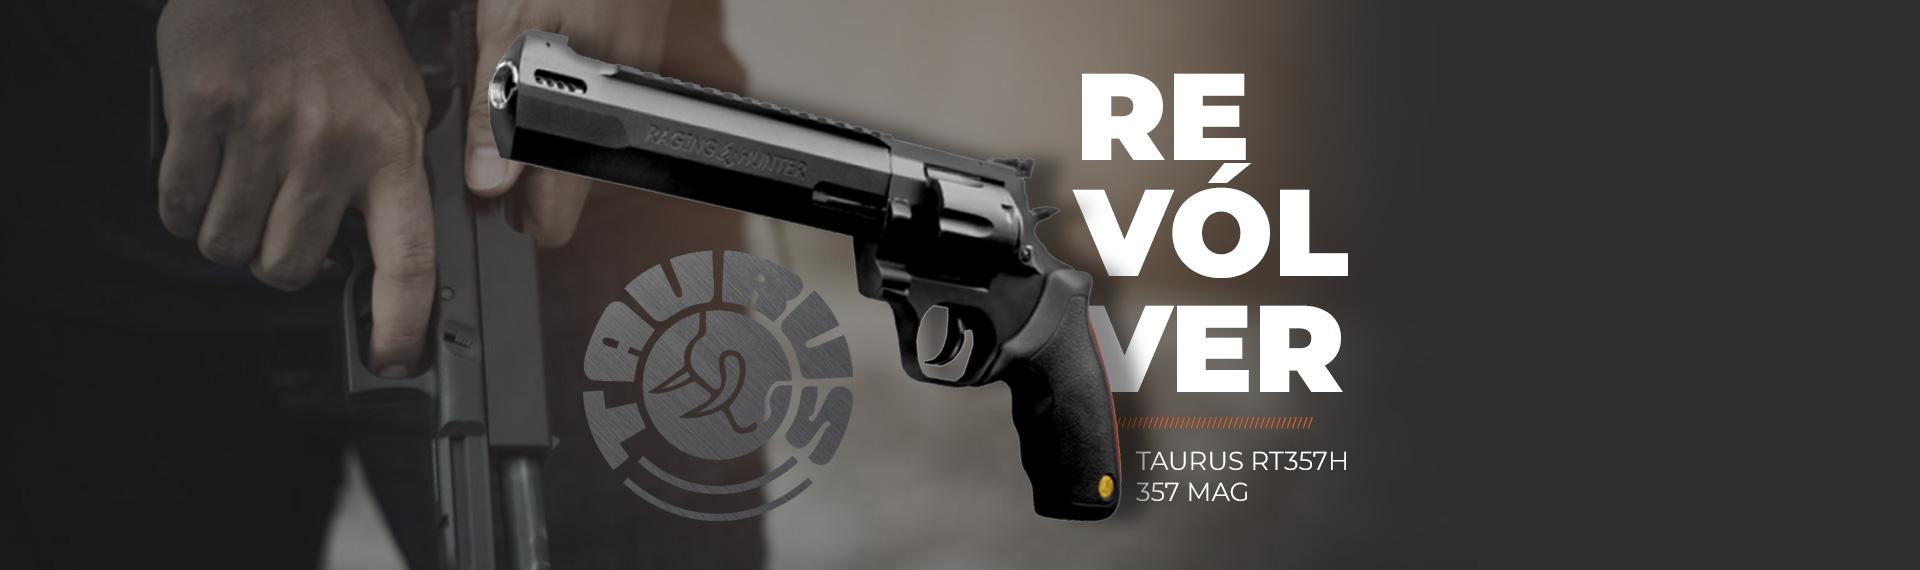 Revolver Taurus RT357H 357 MAG